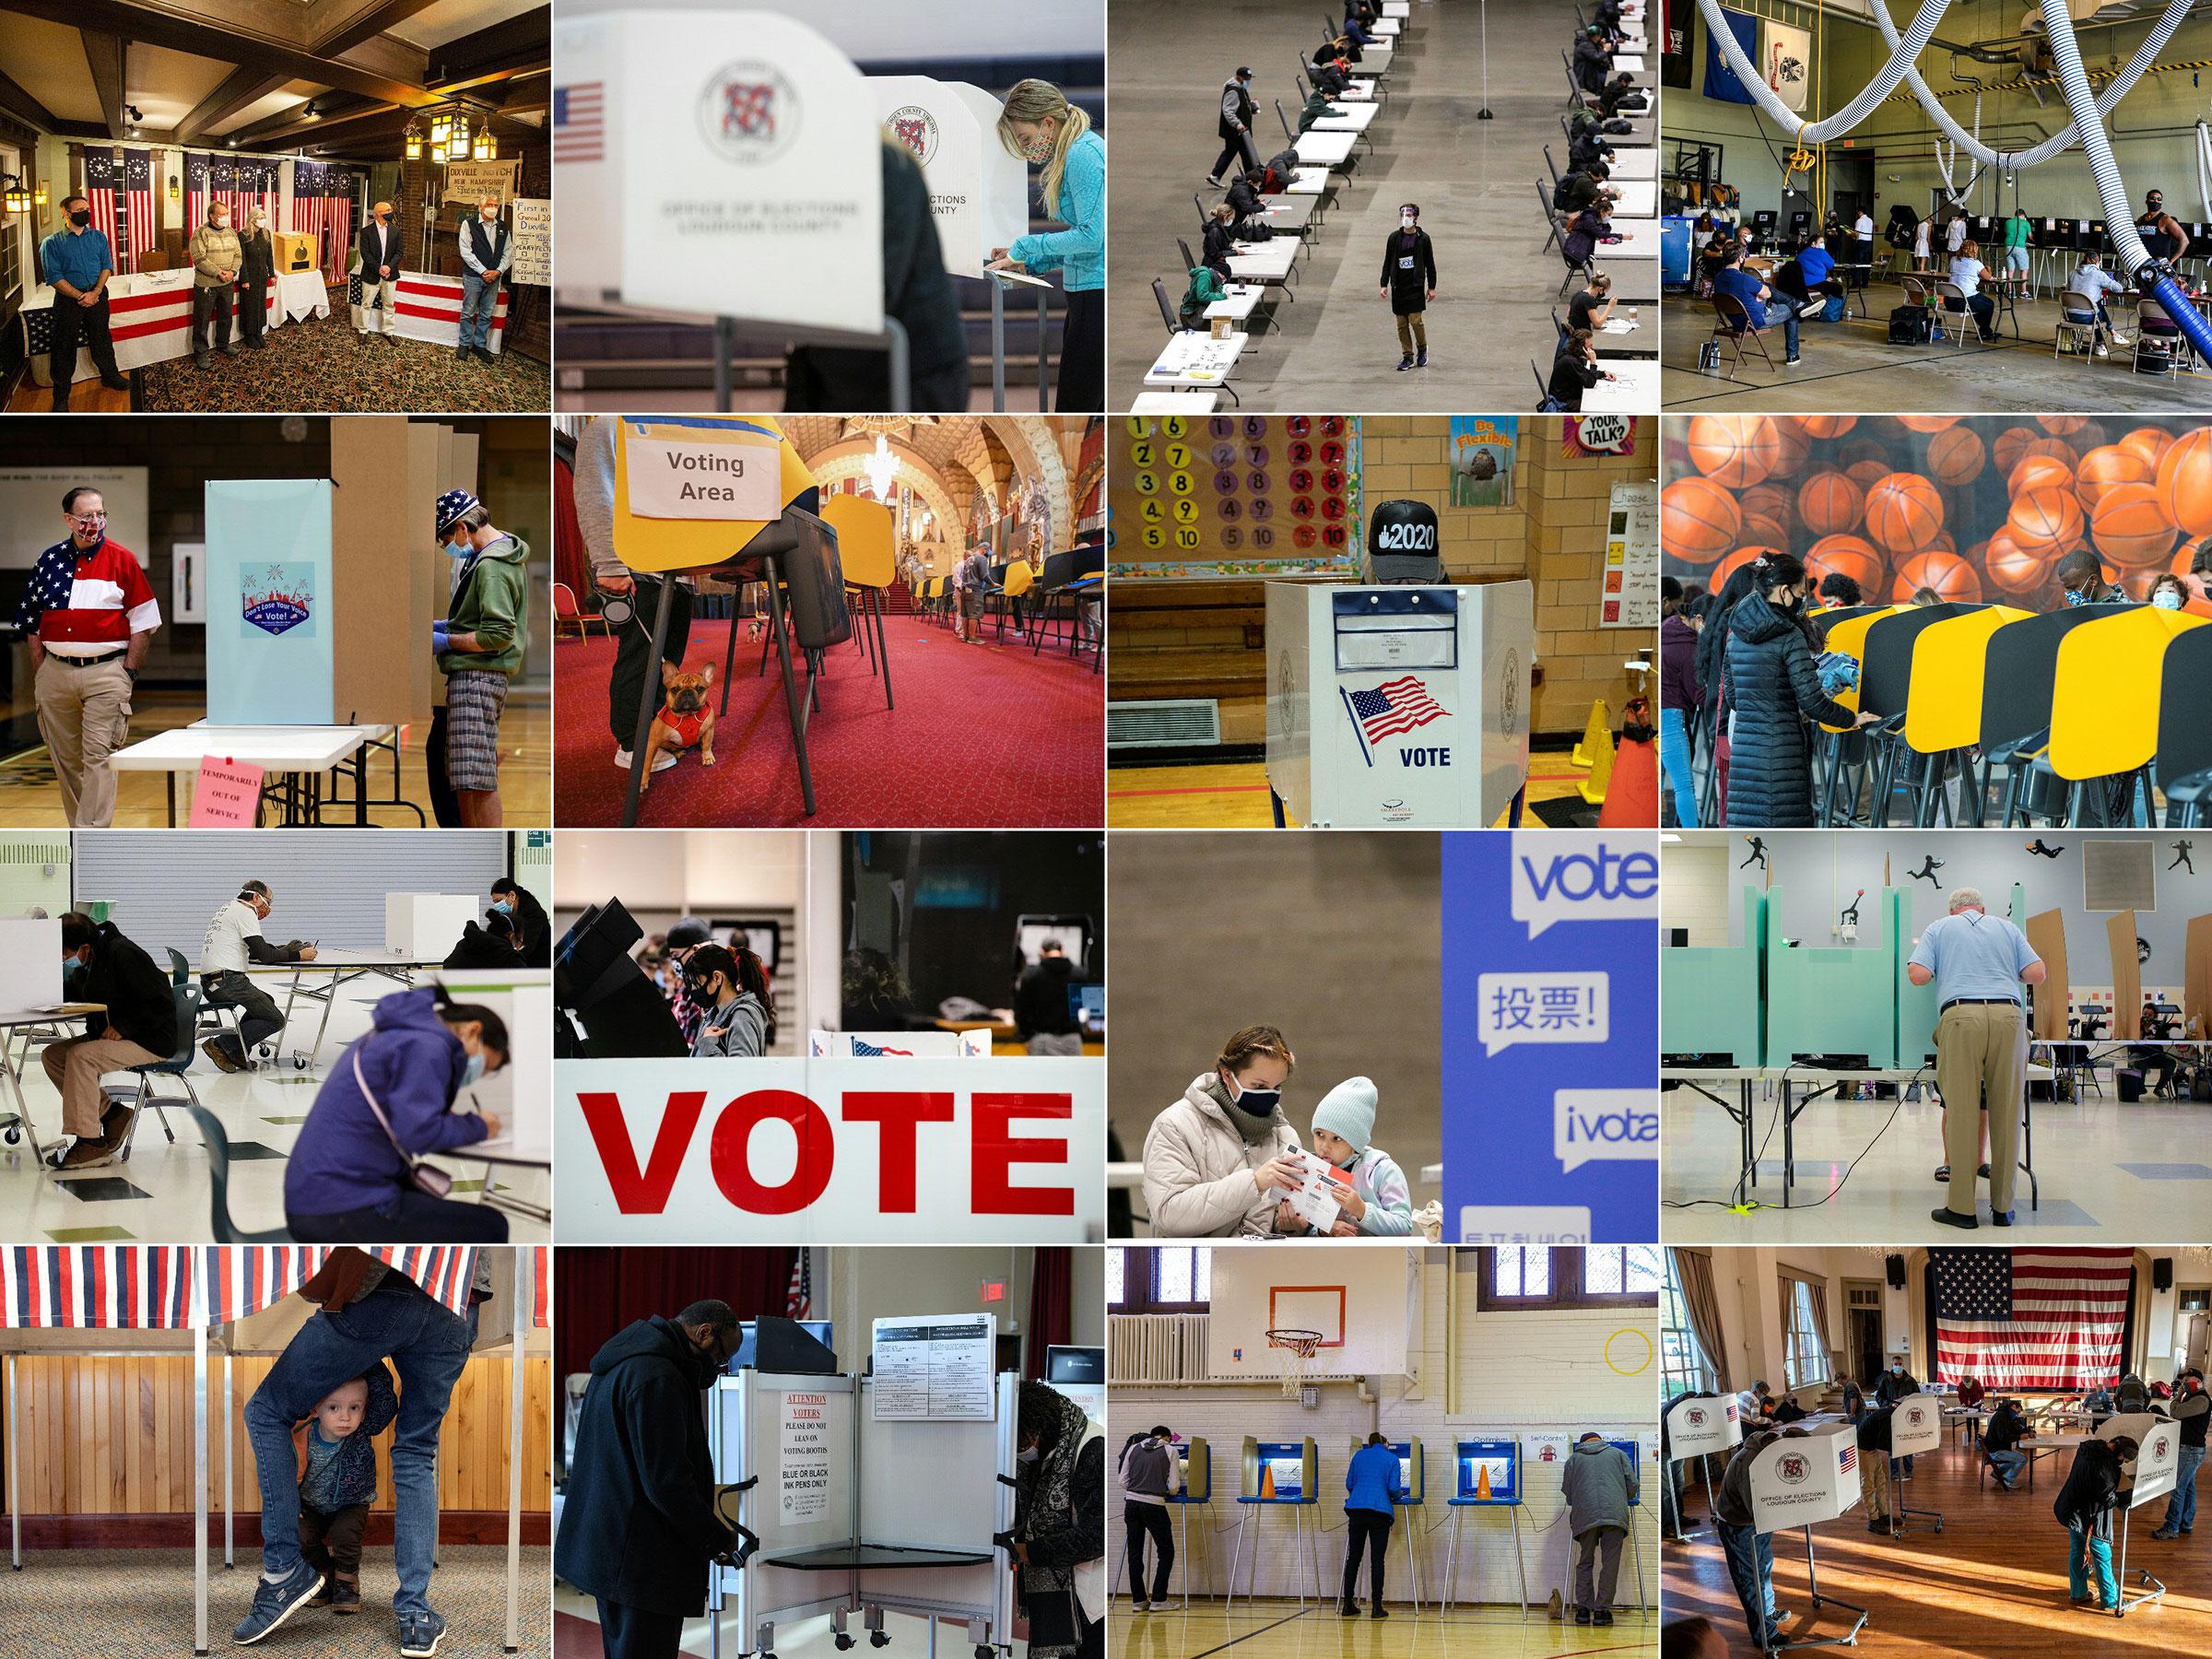 Voters in (from L-R, top to bottom): Dixville Notch, N.H.; Sterling, Va.; Seattle; Miami; Las Vegas; Los Angeles; New York City; Los Angeles; Arlington, Va.; El Paso, Texas; Seattle; Las Vegas; Granby, Colo.; Washington, DC; Minneapolis, Minn.; Hillsboro, Va. on Nov. 3, 2020.